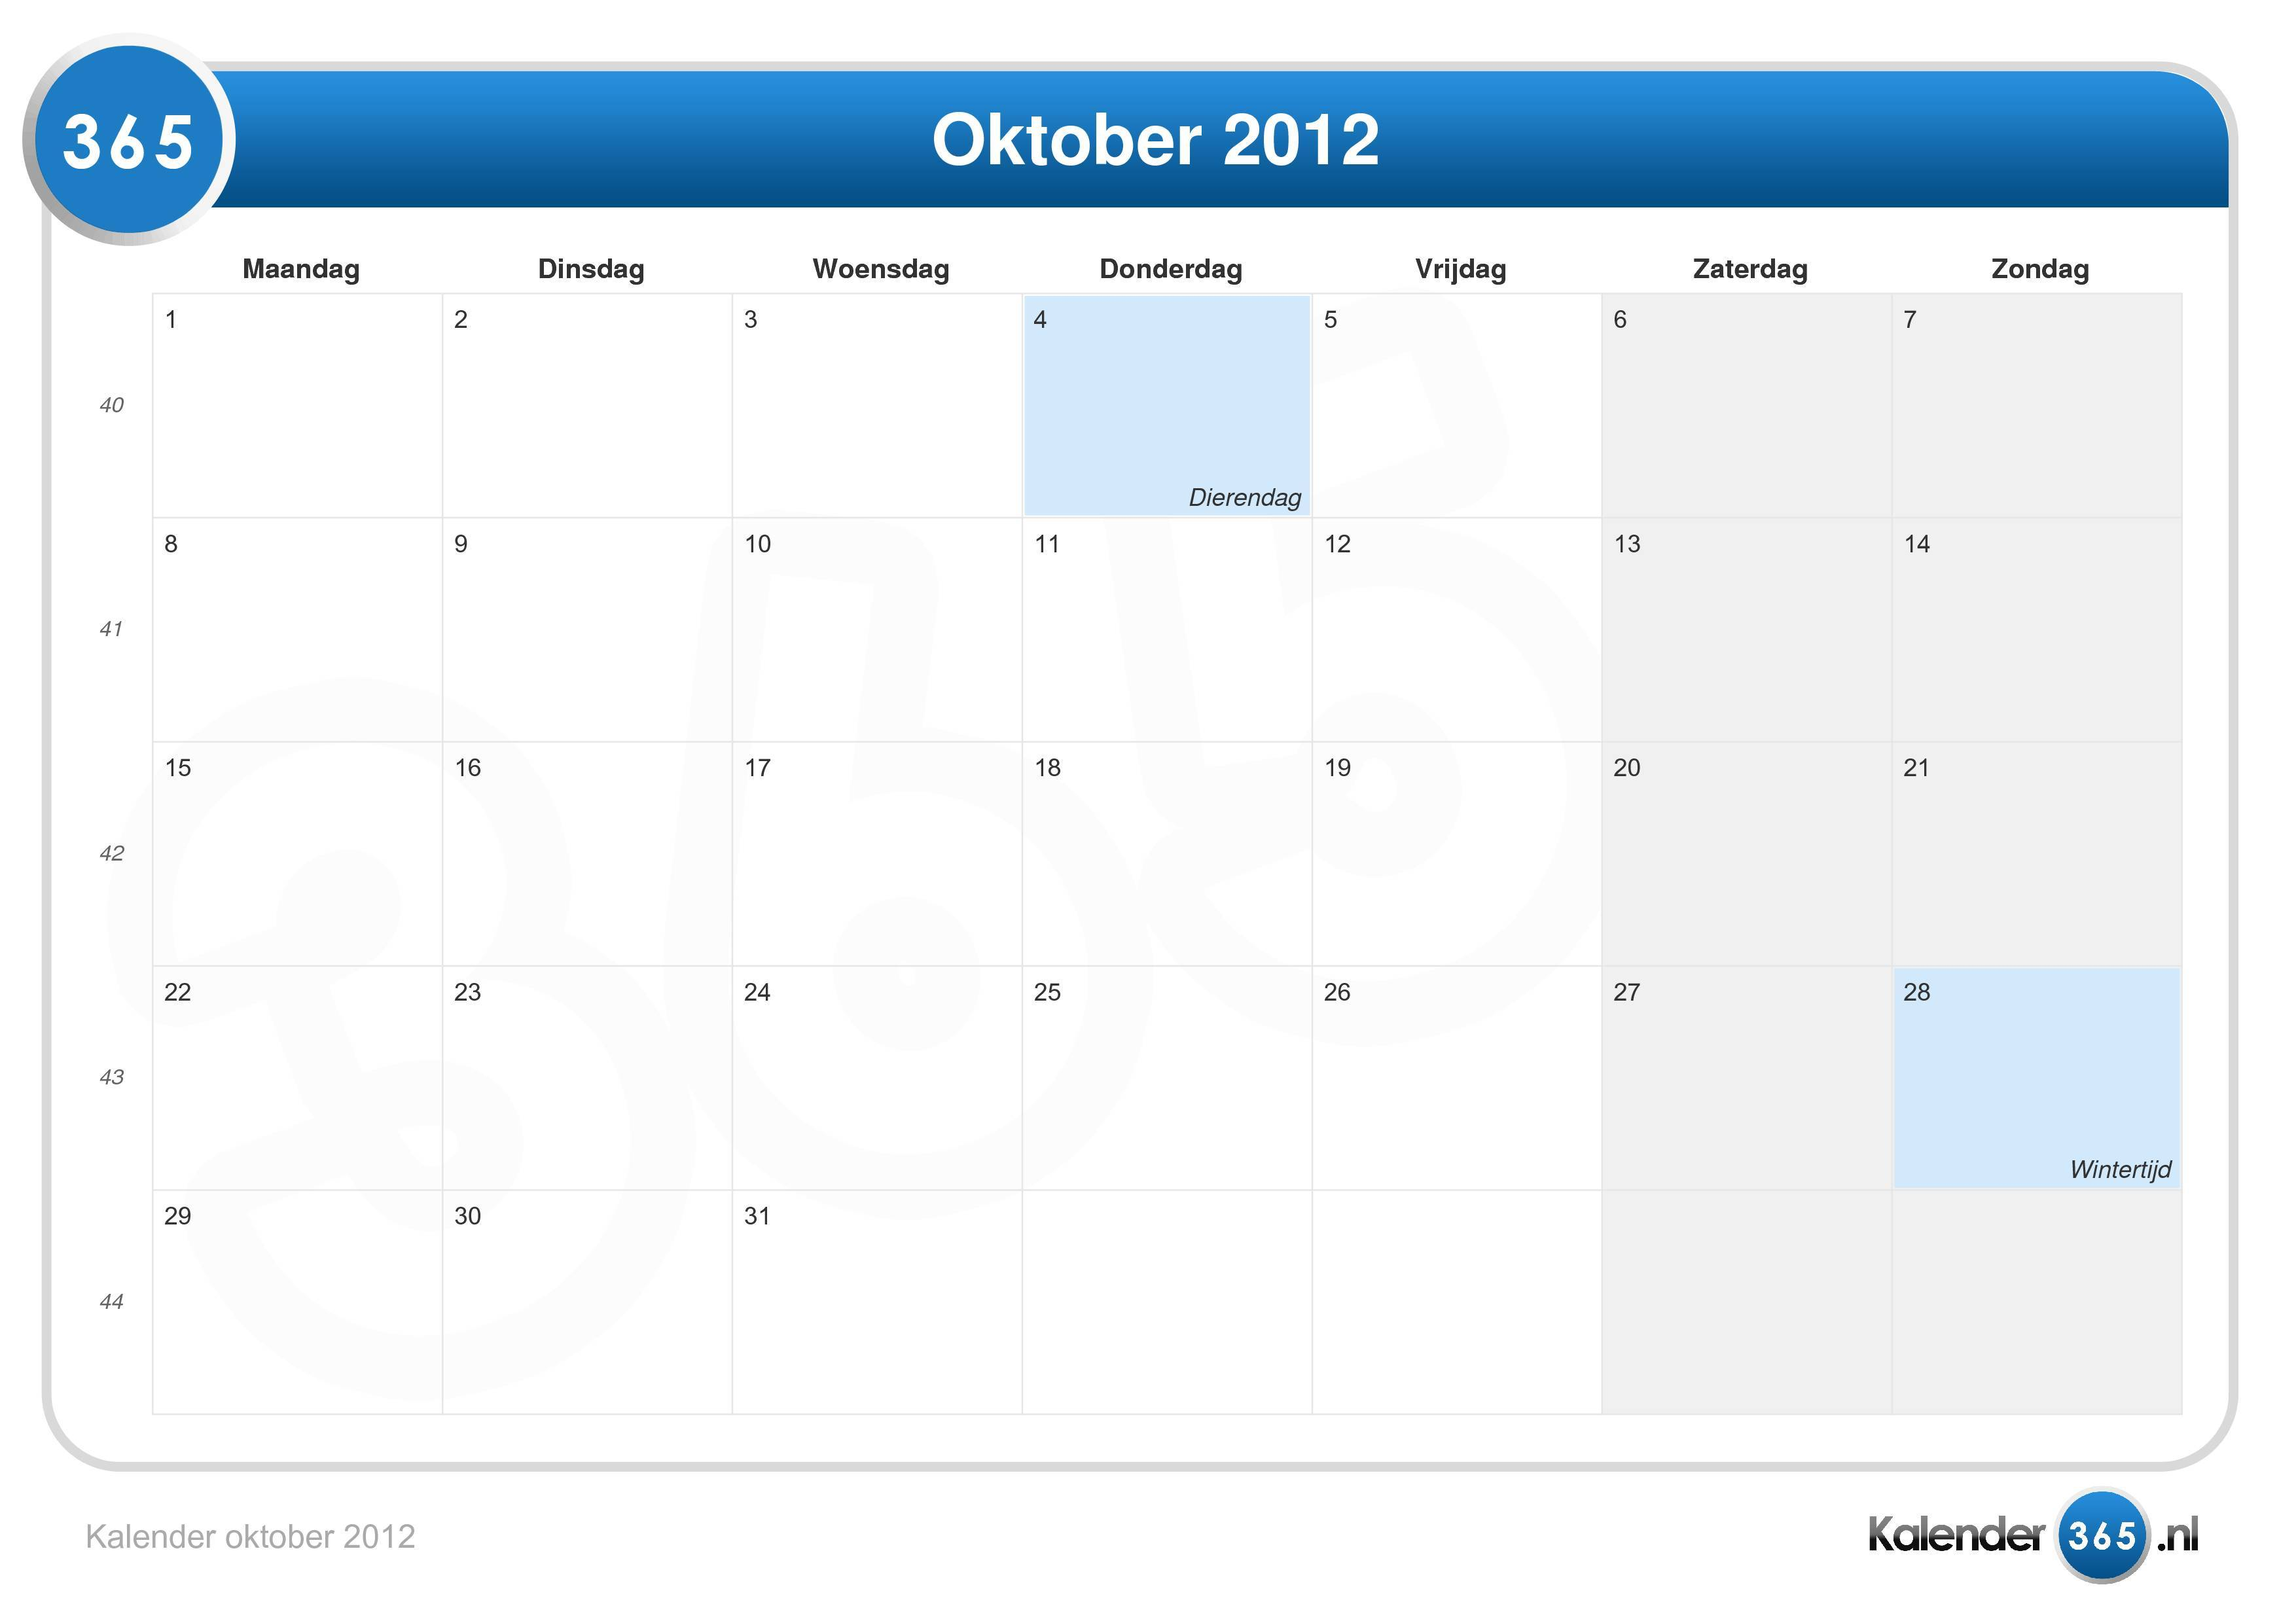 Kalender oktober 2012